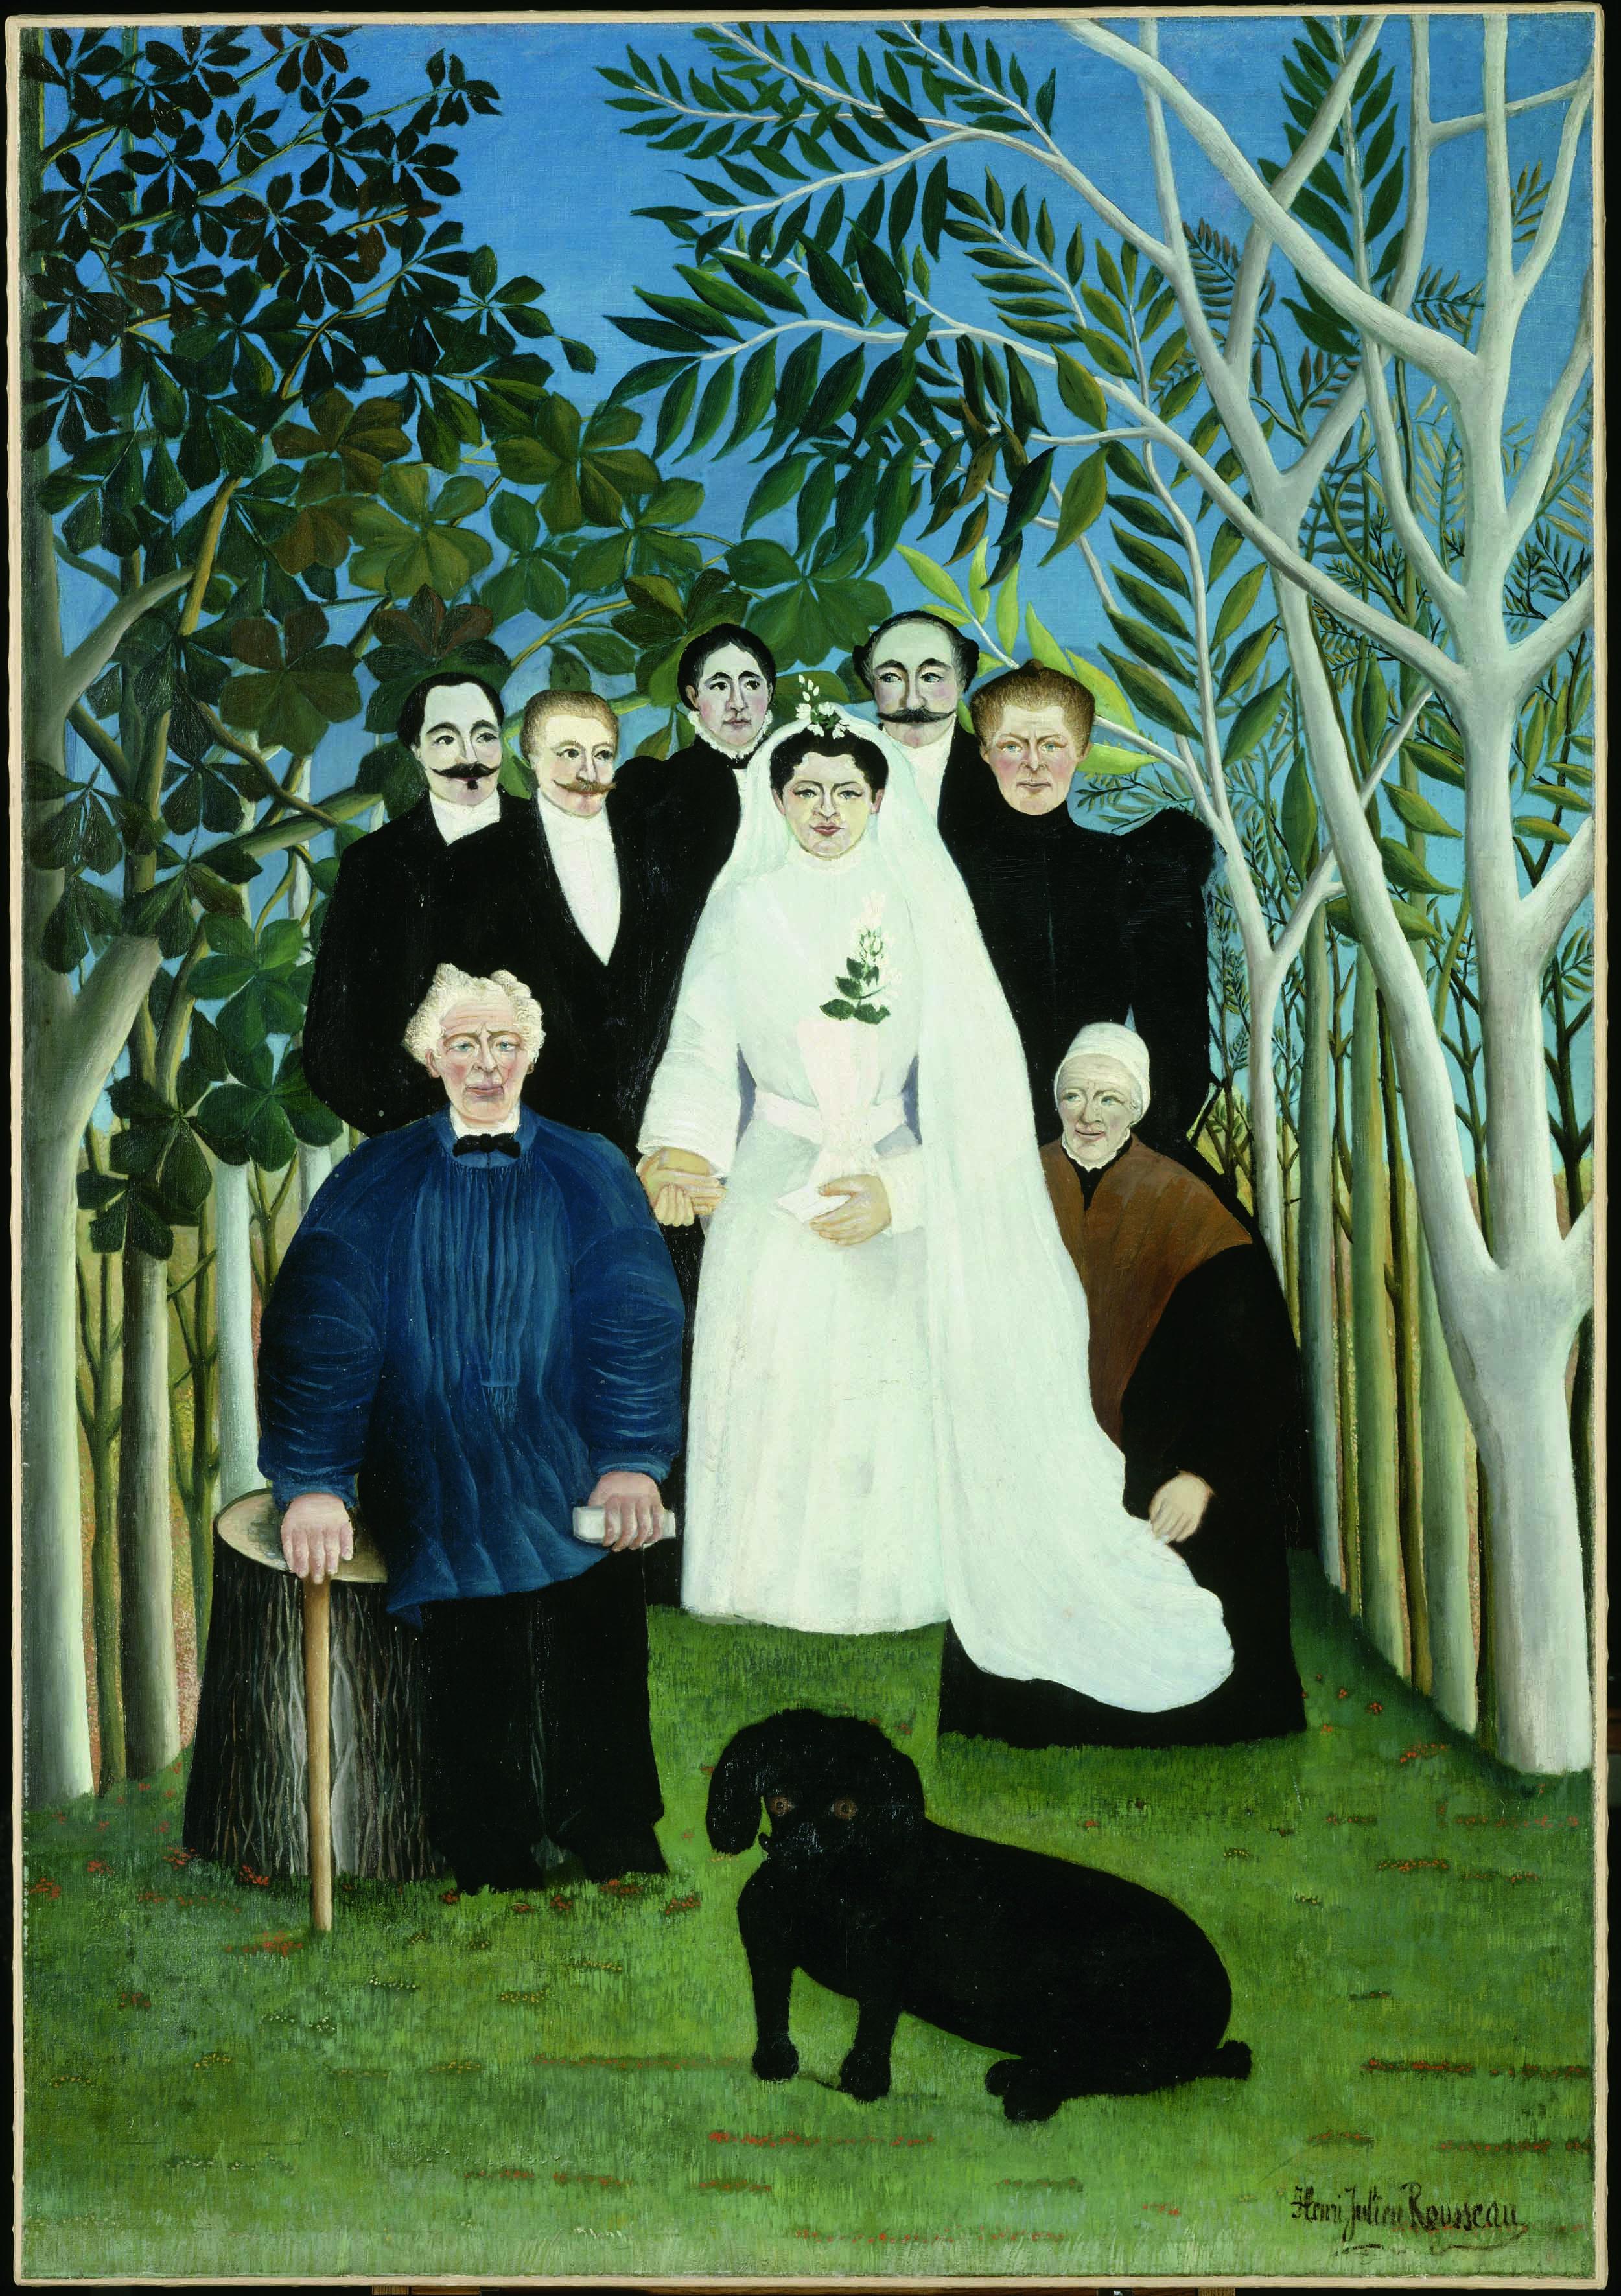 La boda, 1904, óleo sobre lienzo, Musée de l'Orangerie, París.